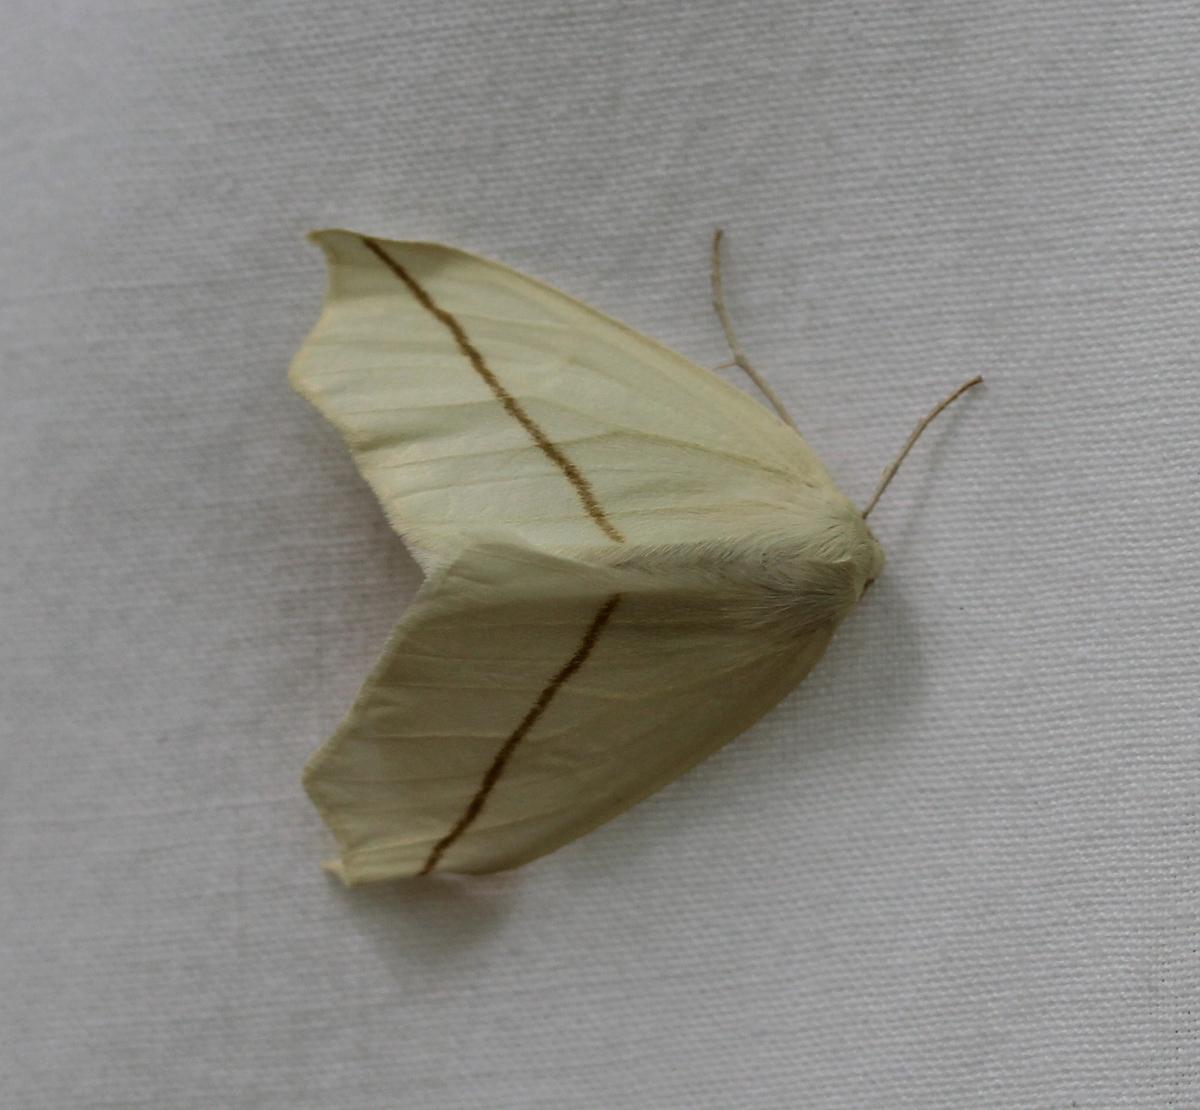 cream/yellow moth on white background